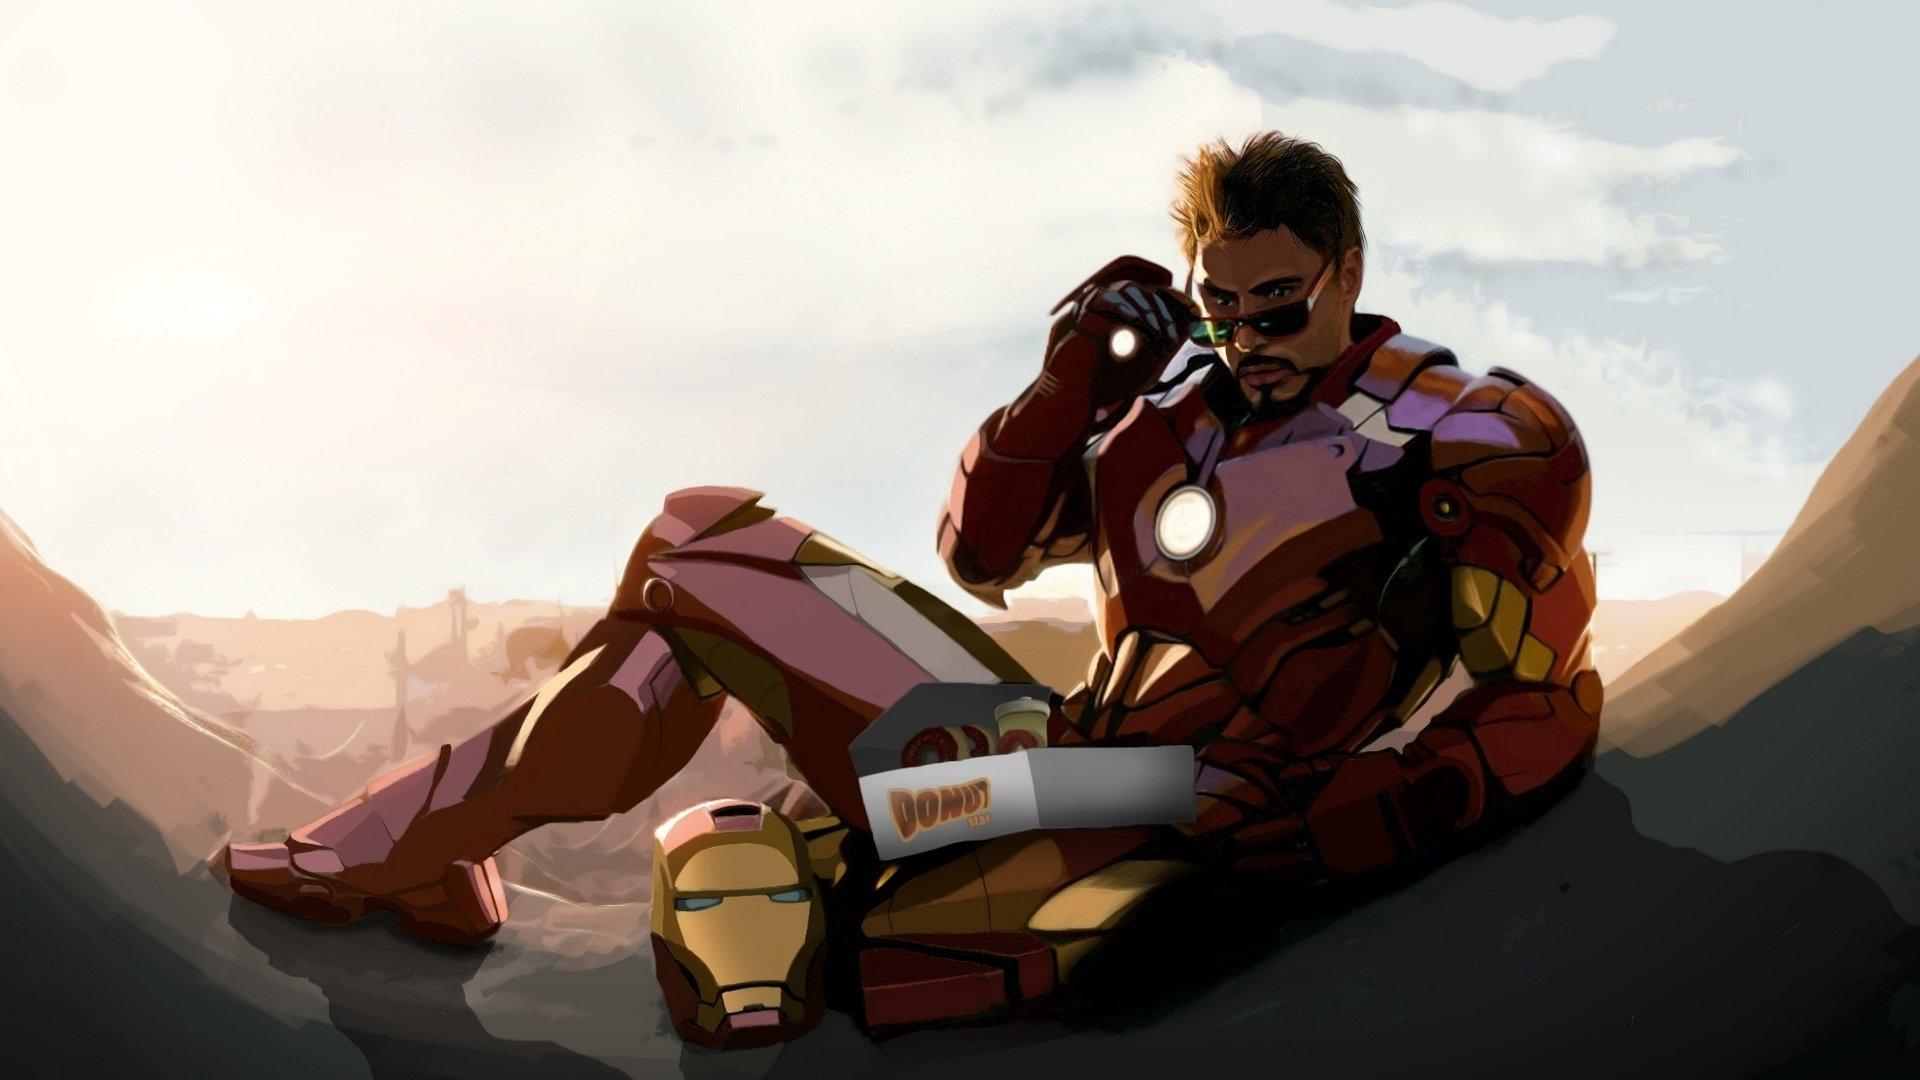 Iron man hd wallpapers backgrounds wallpaper abyss - Iron Man Hd Wallpaper Background Id 435598